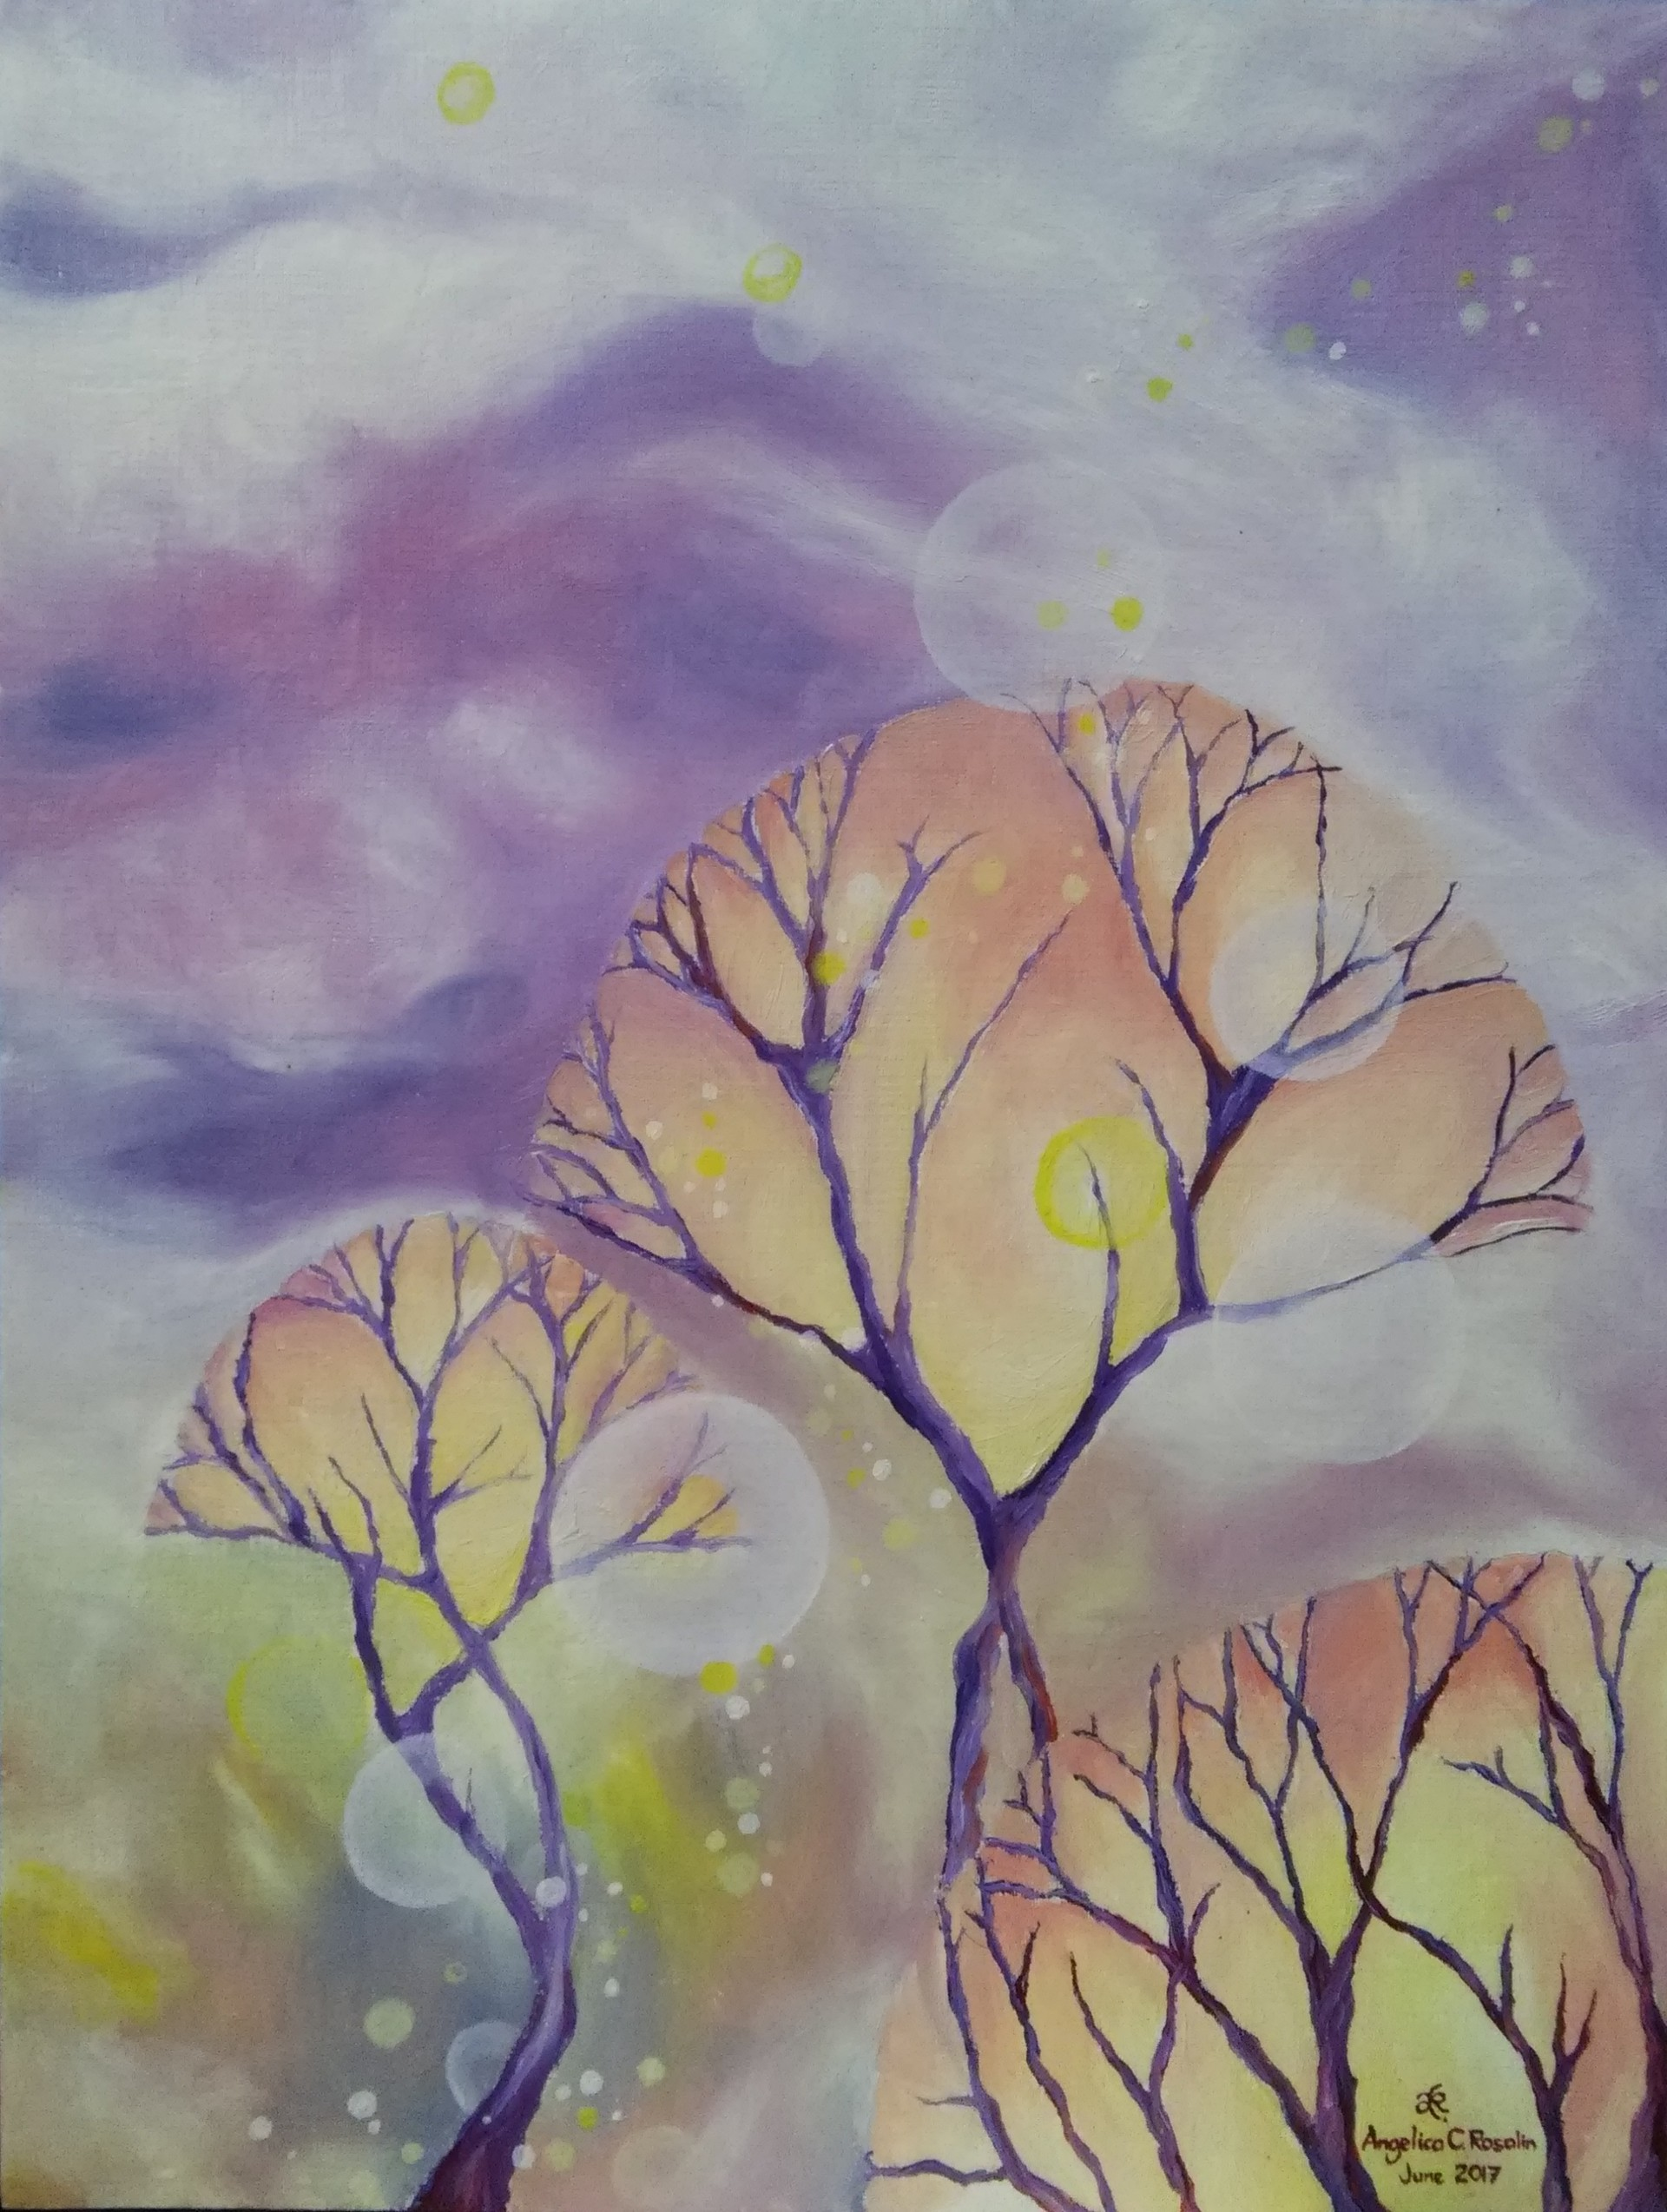 ArtStation - trees in a violet haze, AnnaMarieAngelica Rosalin